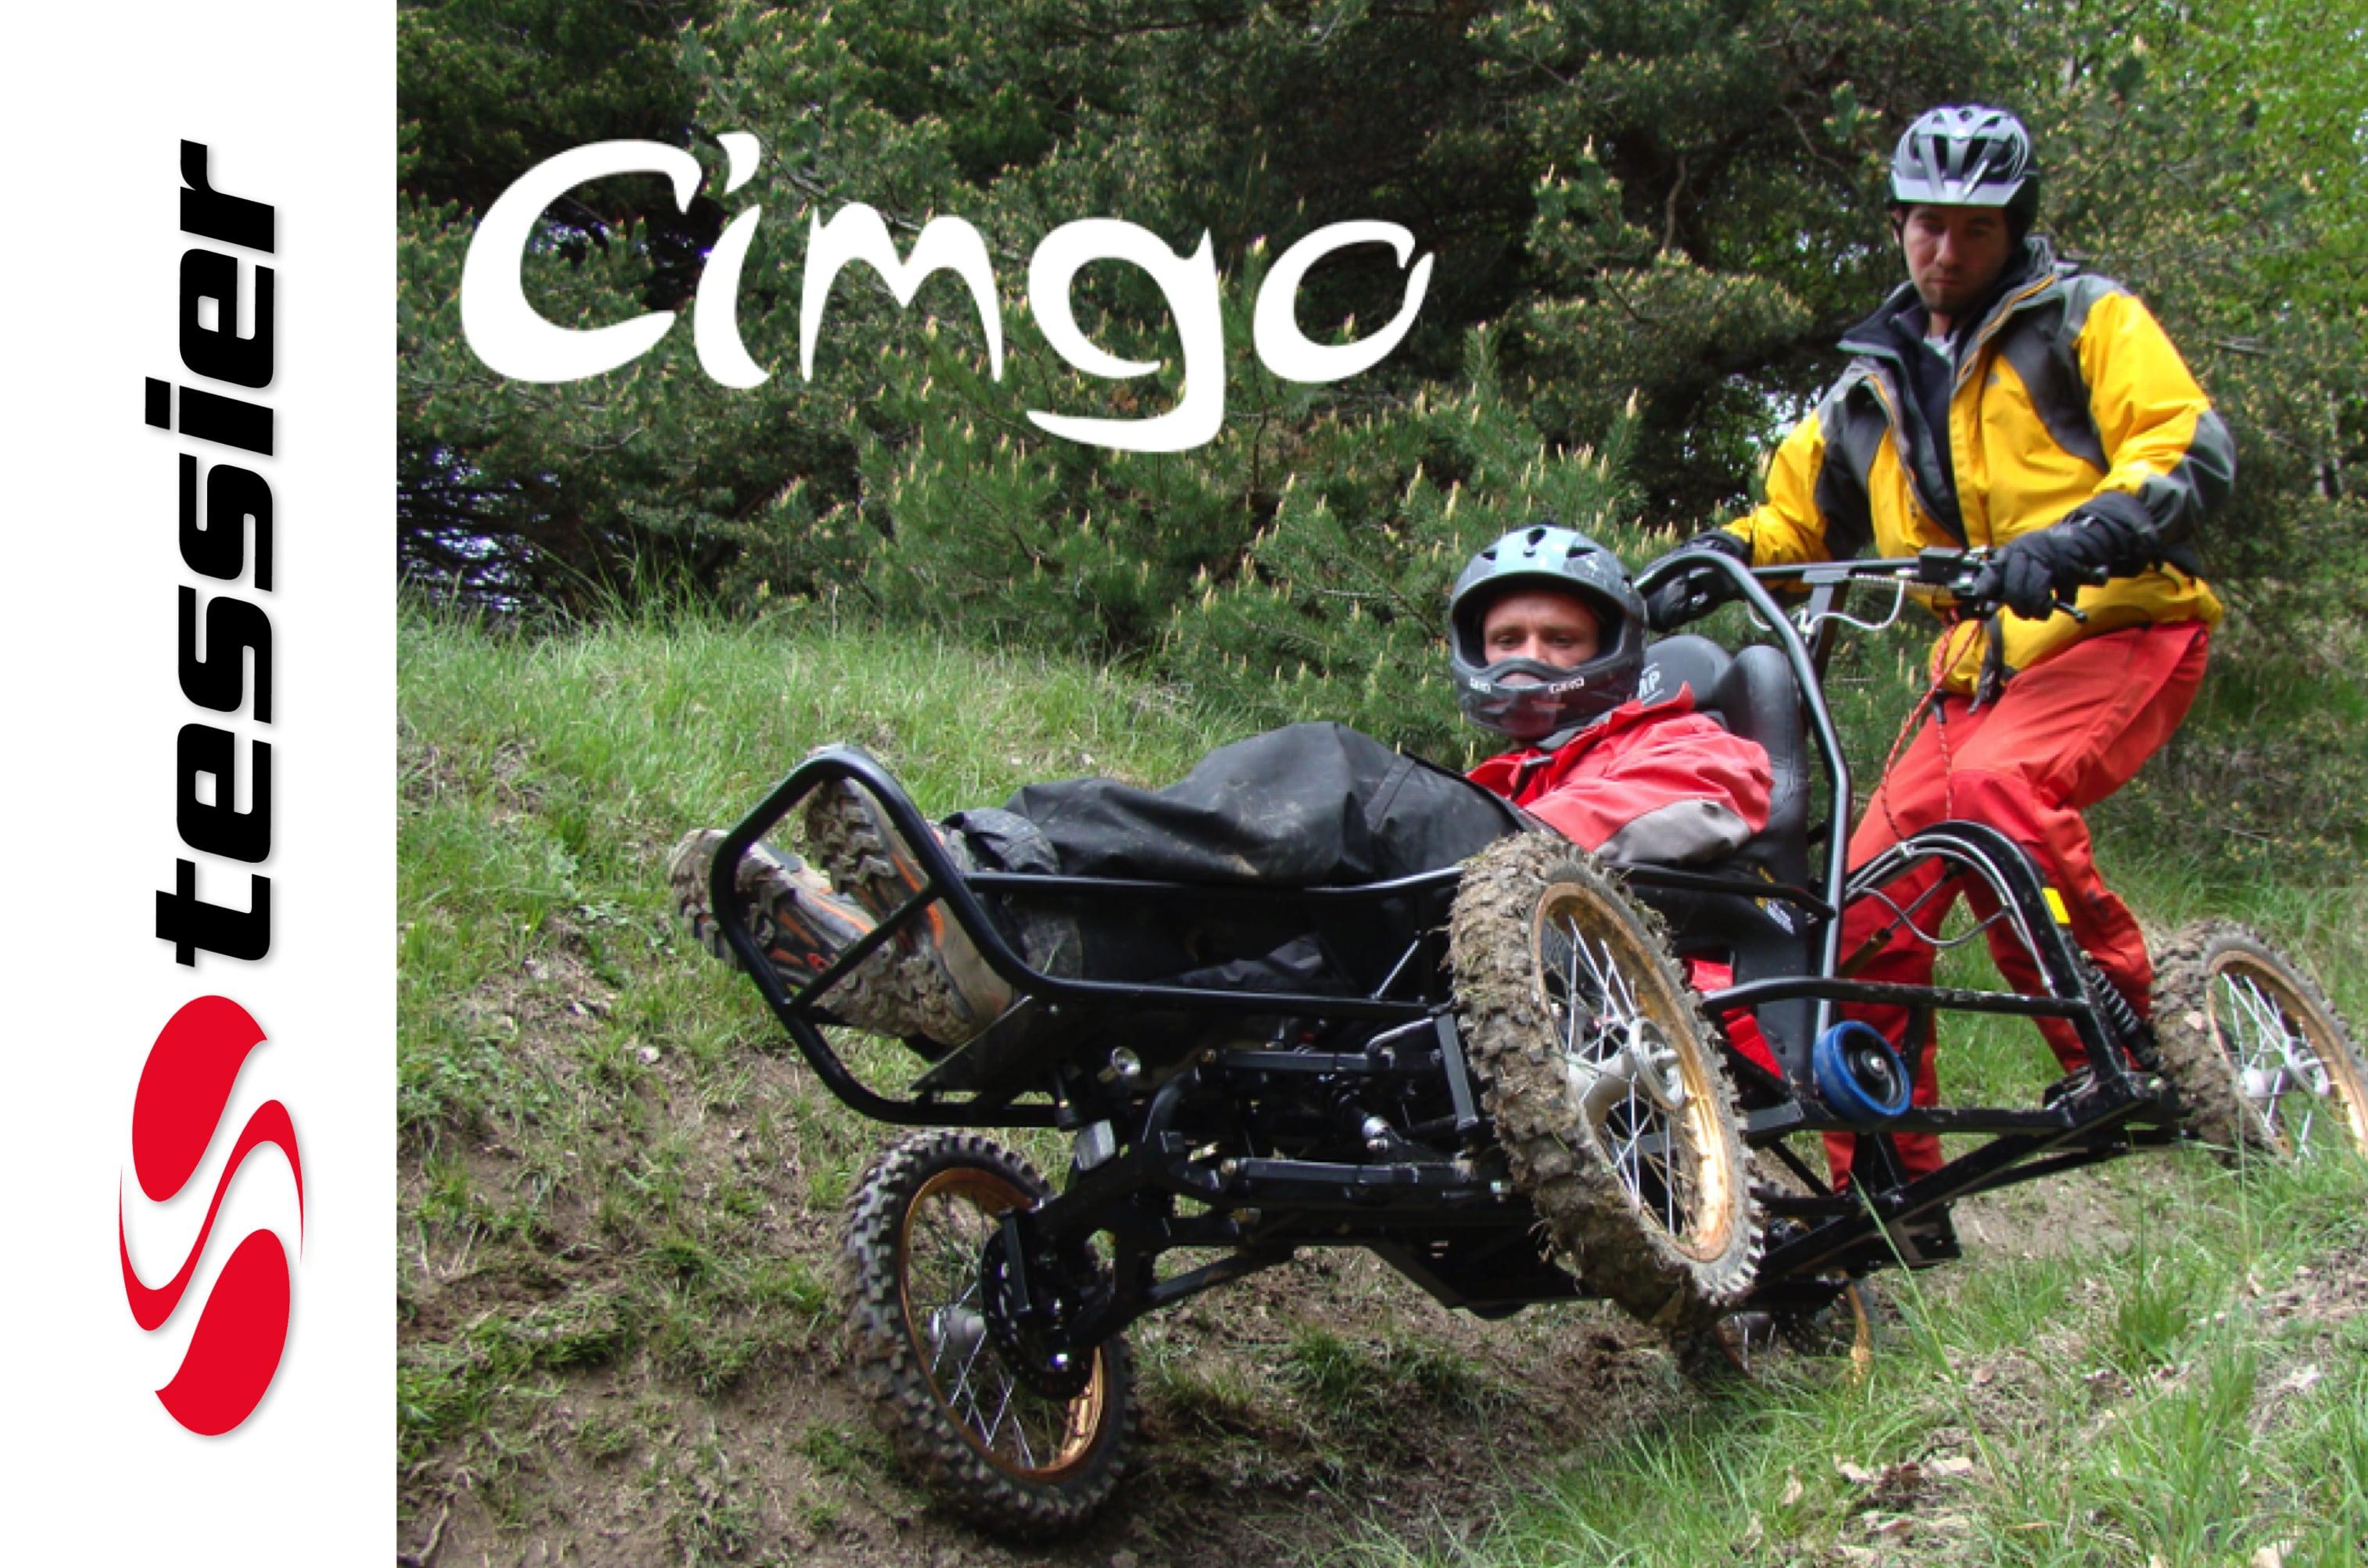 cimgo00